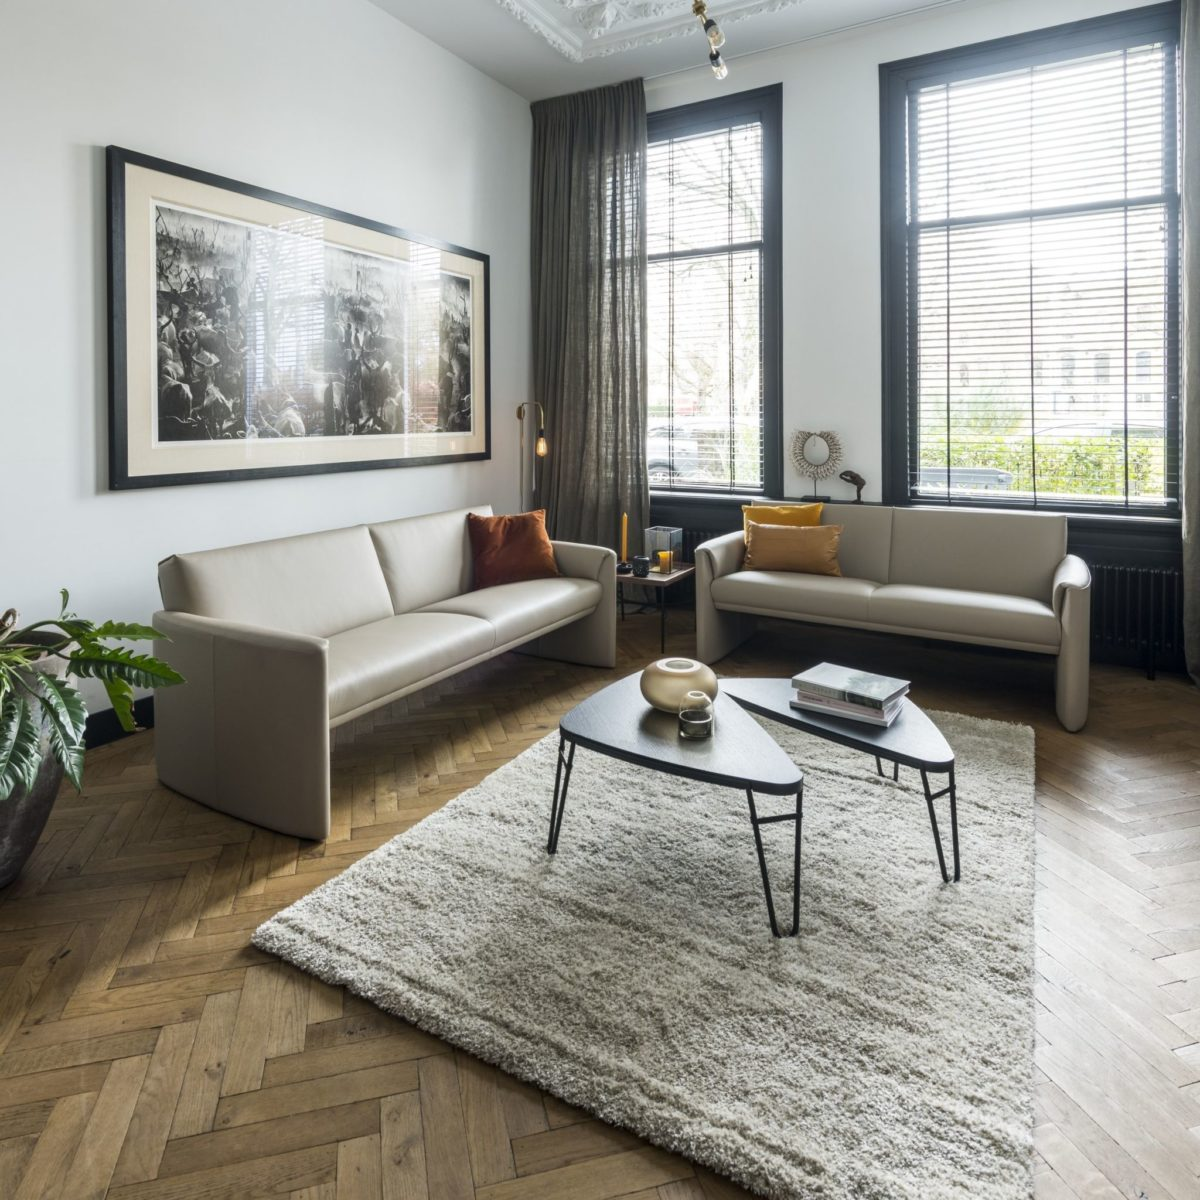 Évidence Boavista Leolux sofa bankstel 2018 A 024